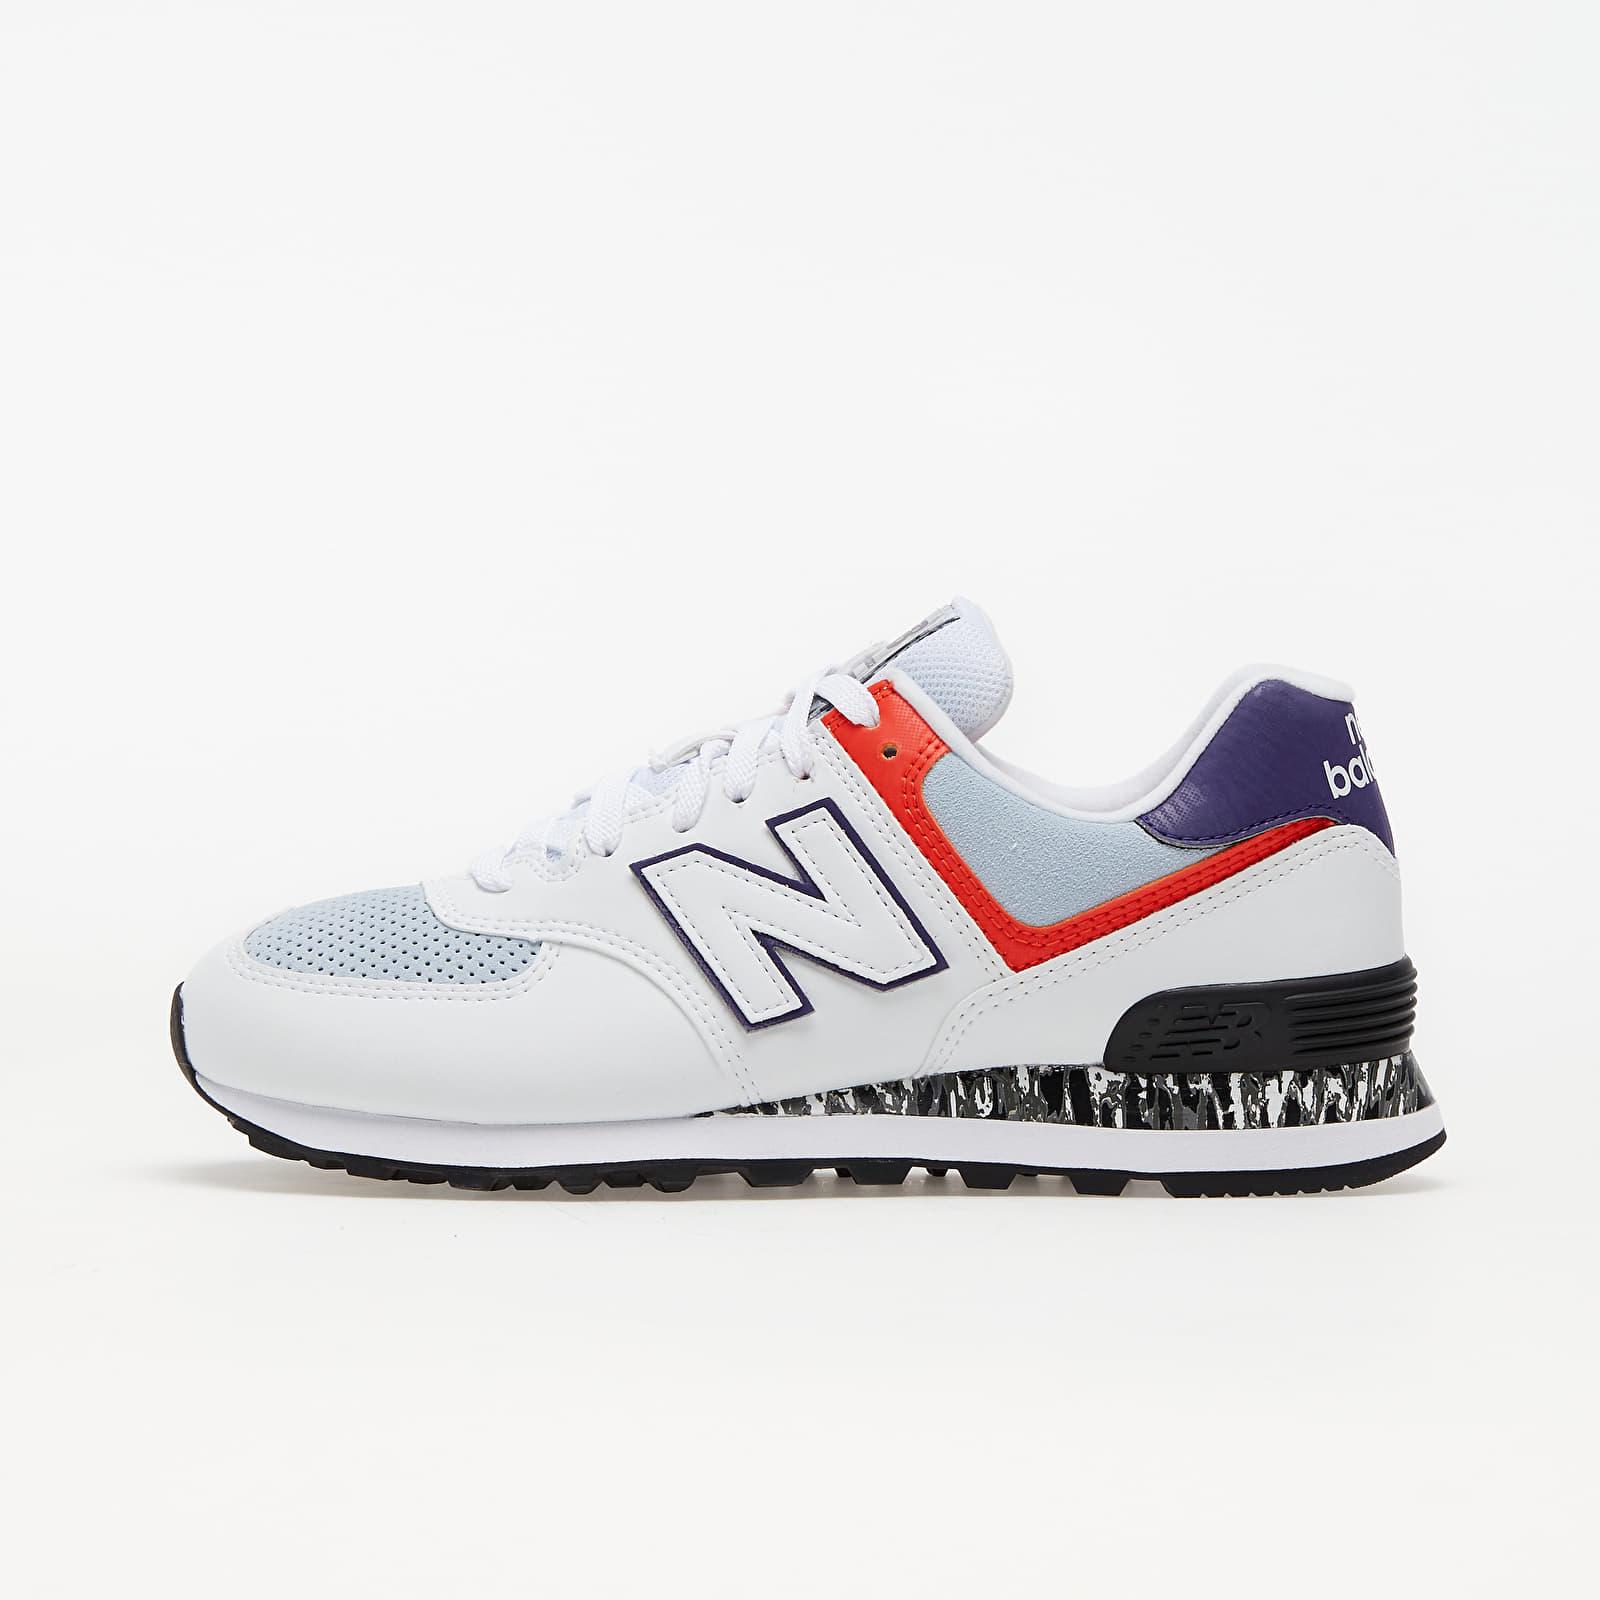 New Balance 574 White/ Orange/ Black EUR 36.5